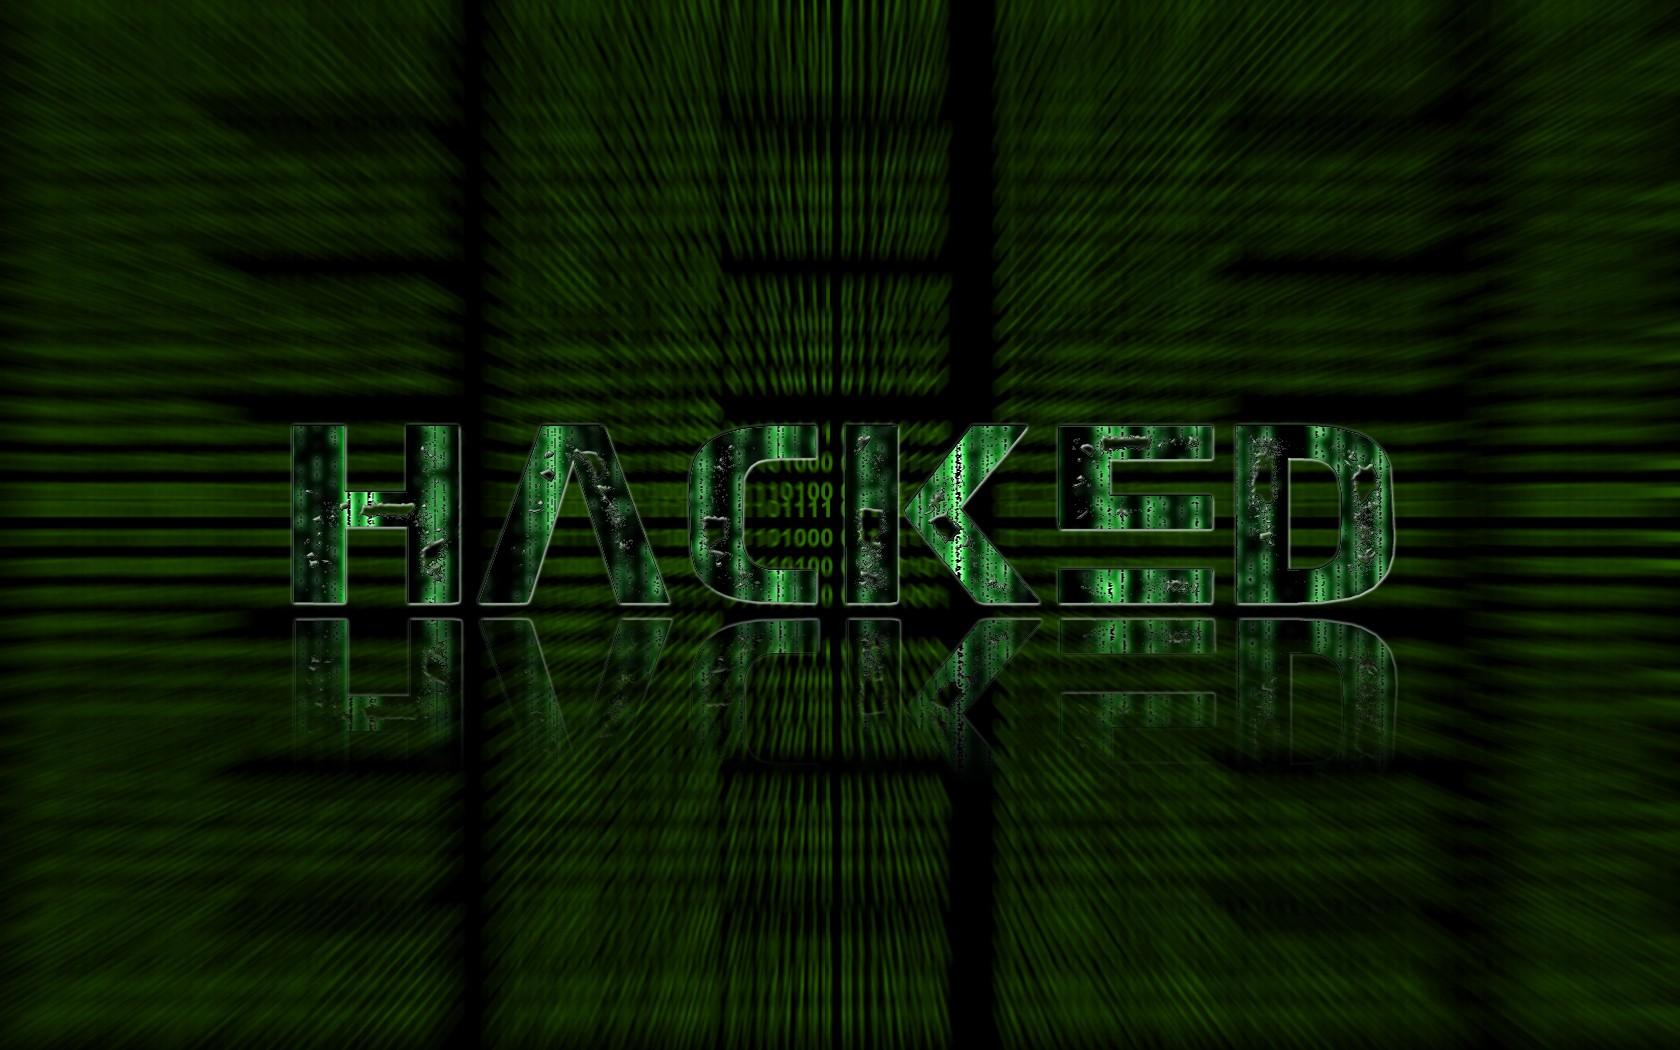 Hacking hackers wallpaper 1680x1050 61903 WallpaperUP 1680x1050